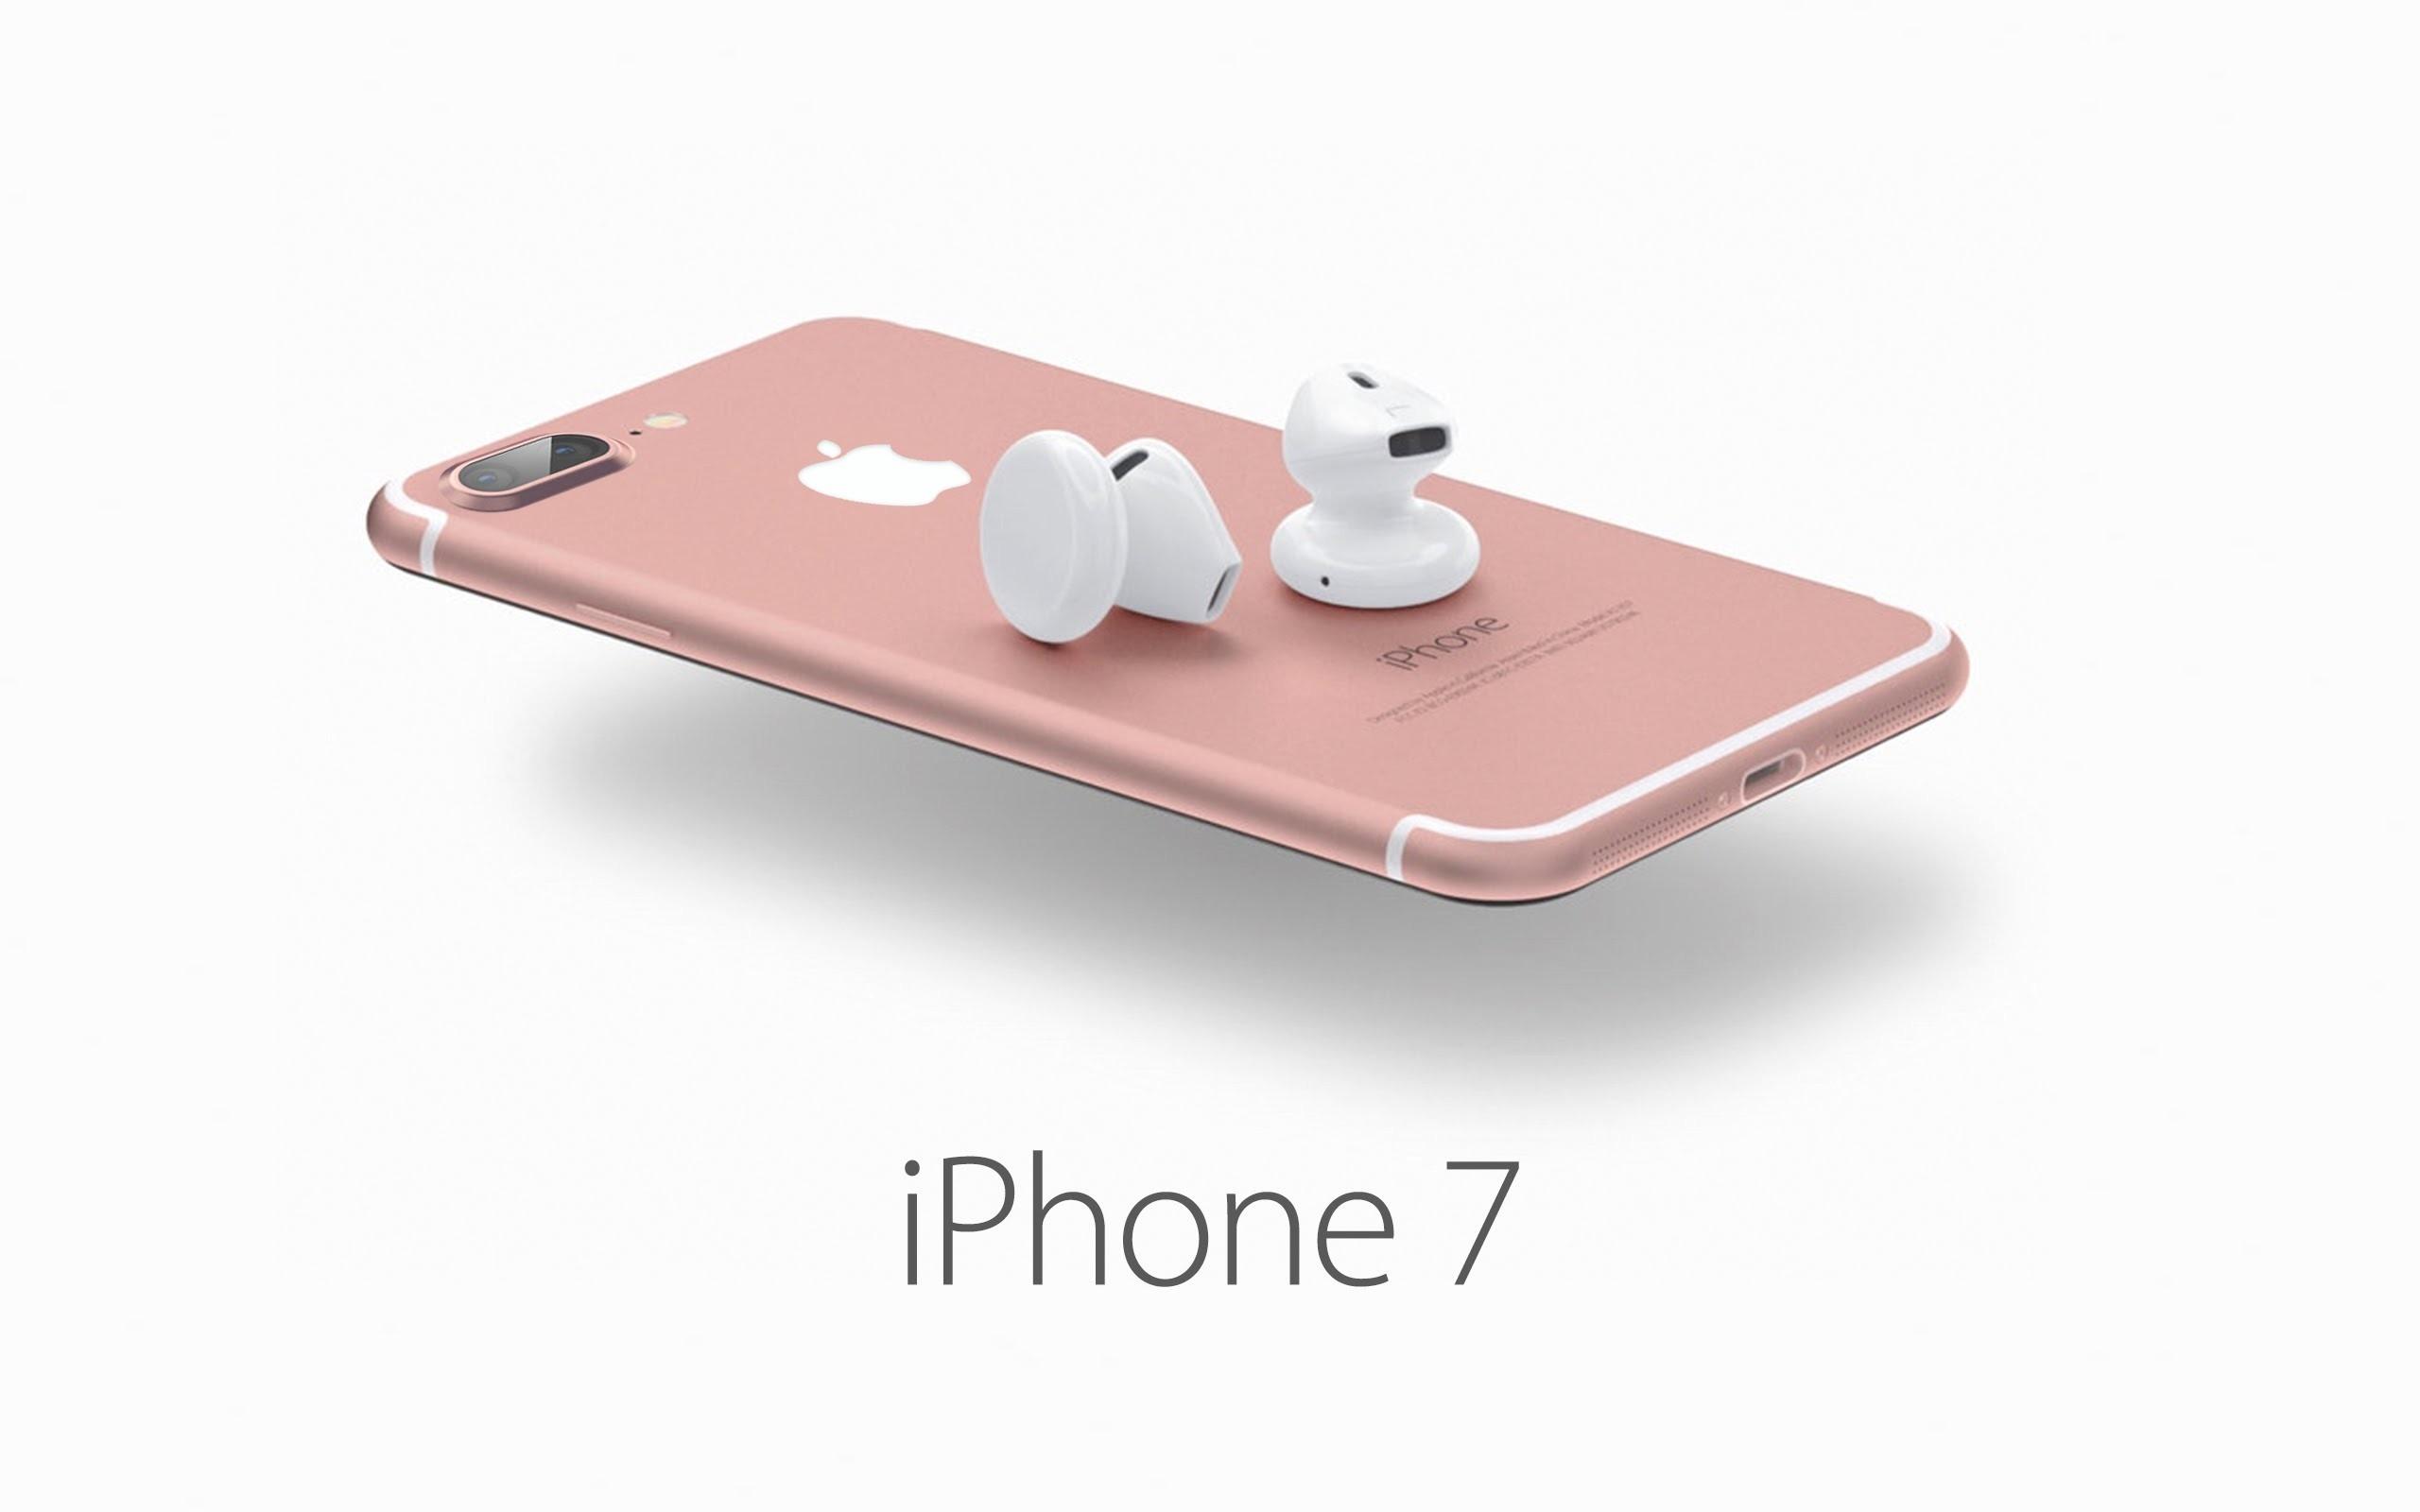 Назван размер оперативной памяти нового iPhone 7